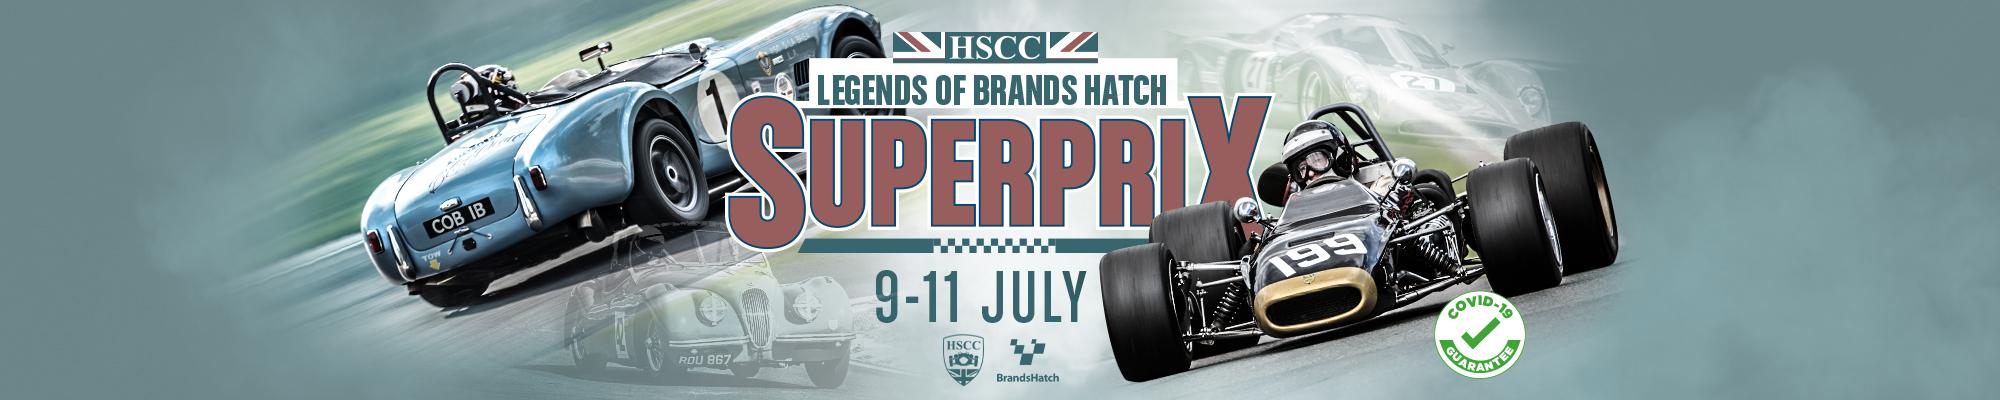 HSCC Legends of Brands Hatch Superprix